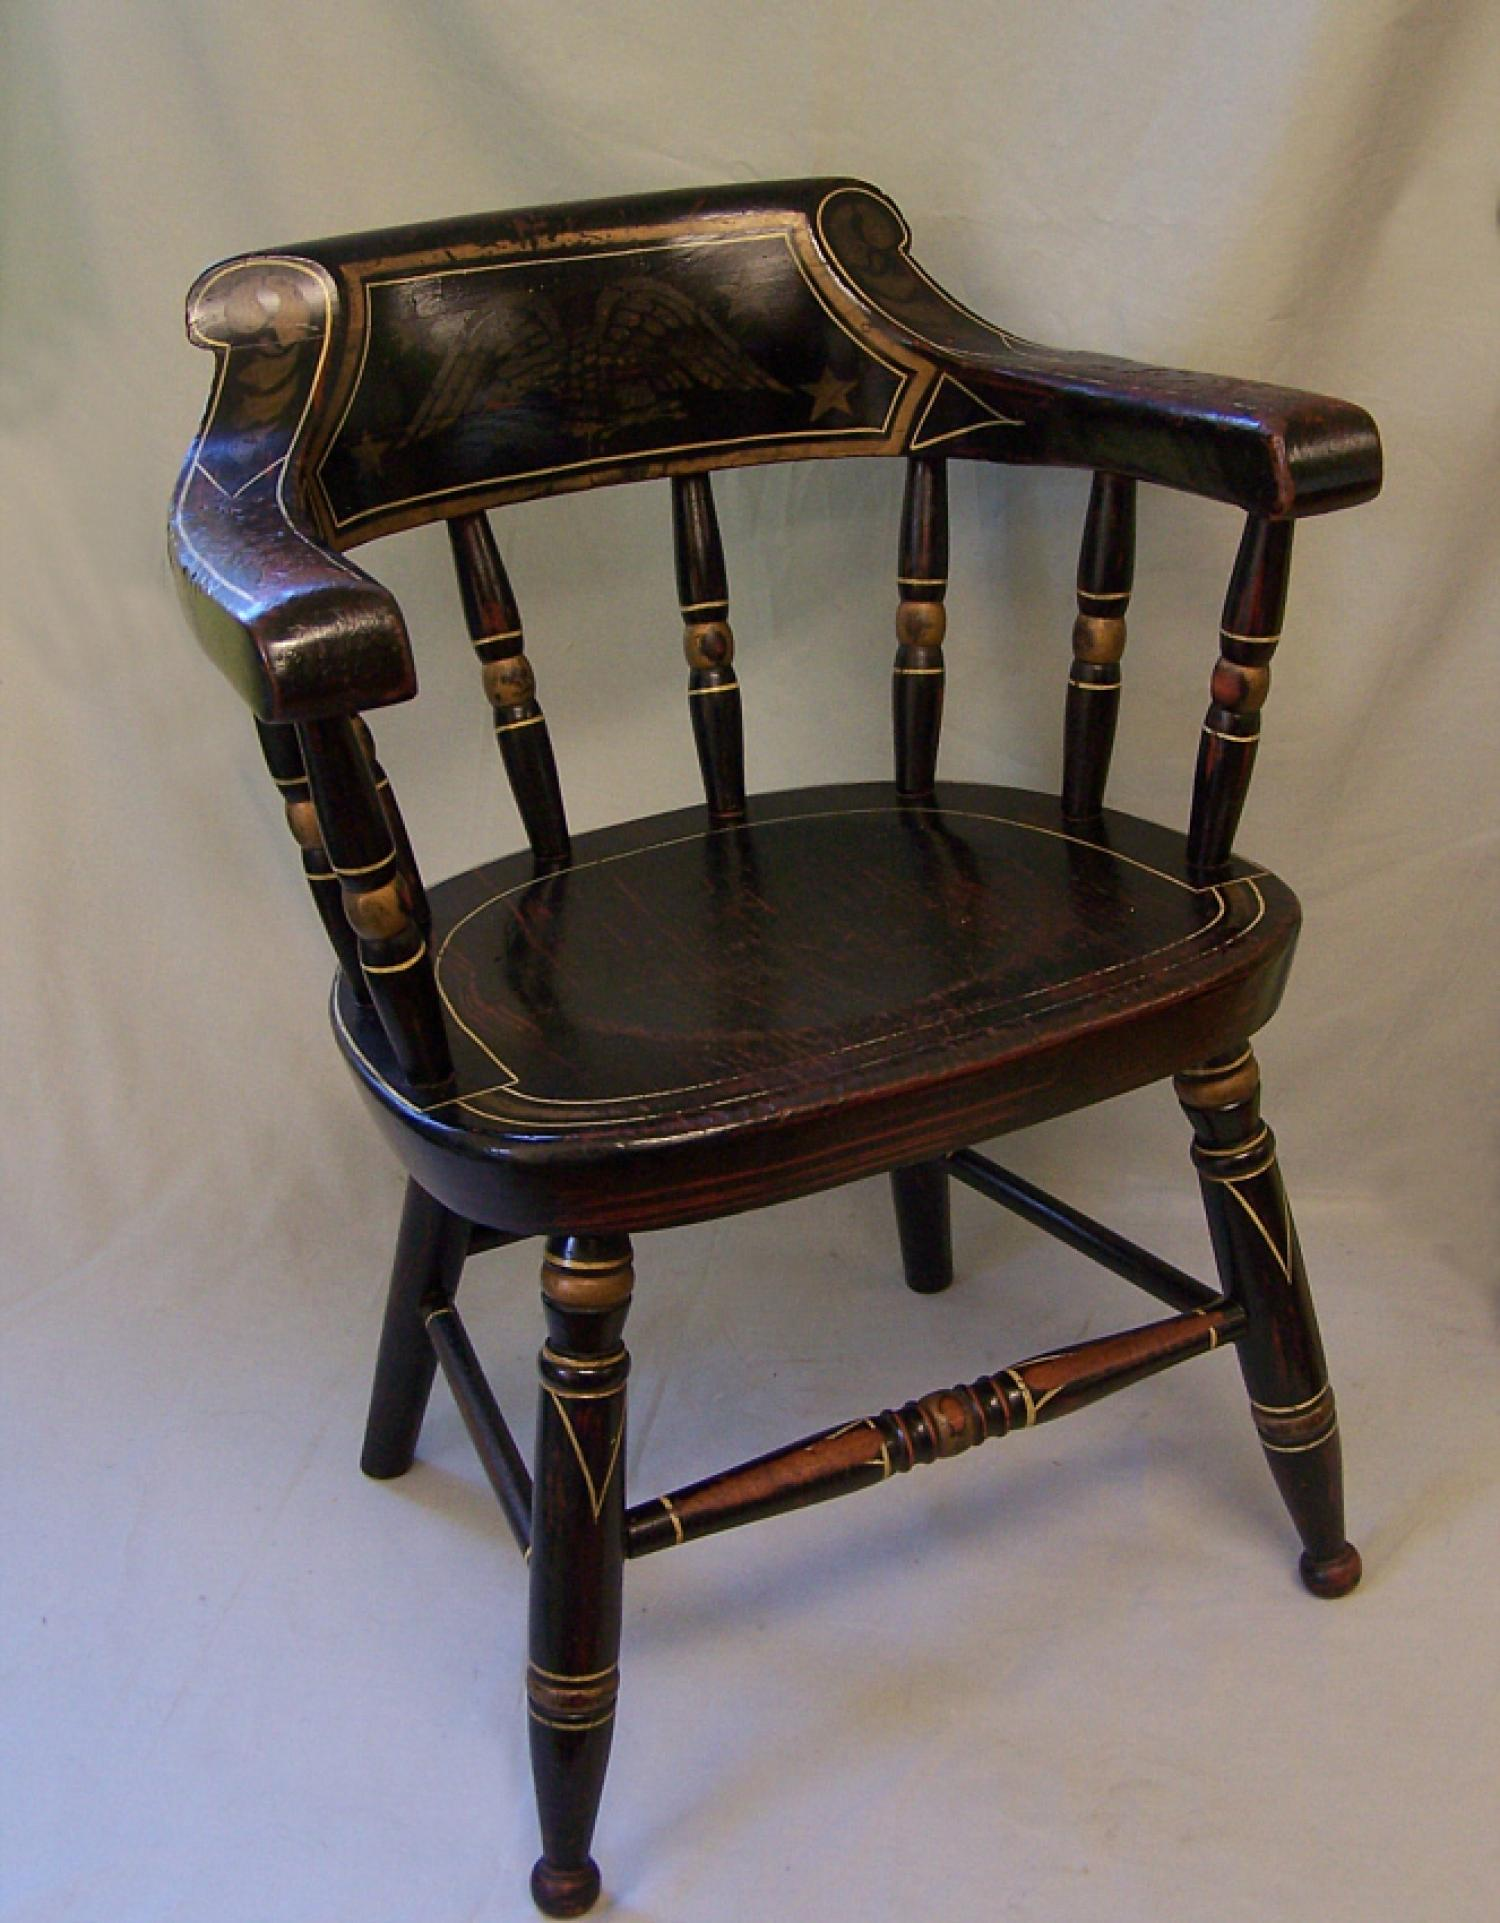 Rare set of twelve victorian solid oak leather antique chairs empire - Antique Search Page One Of A Kind Antiques Essex Connecticut Antique Dealer